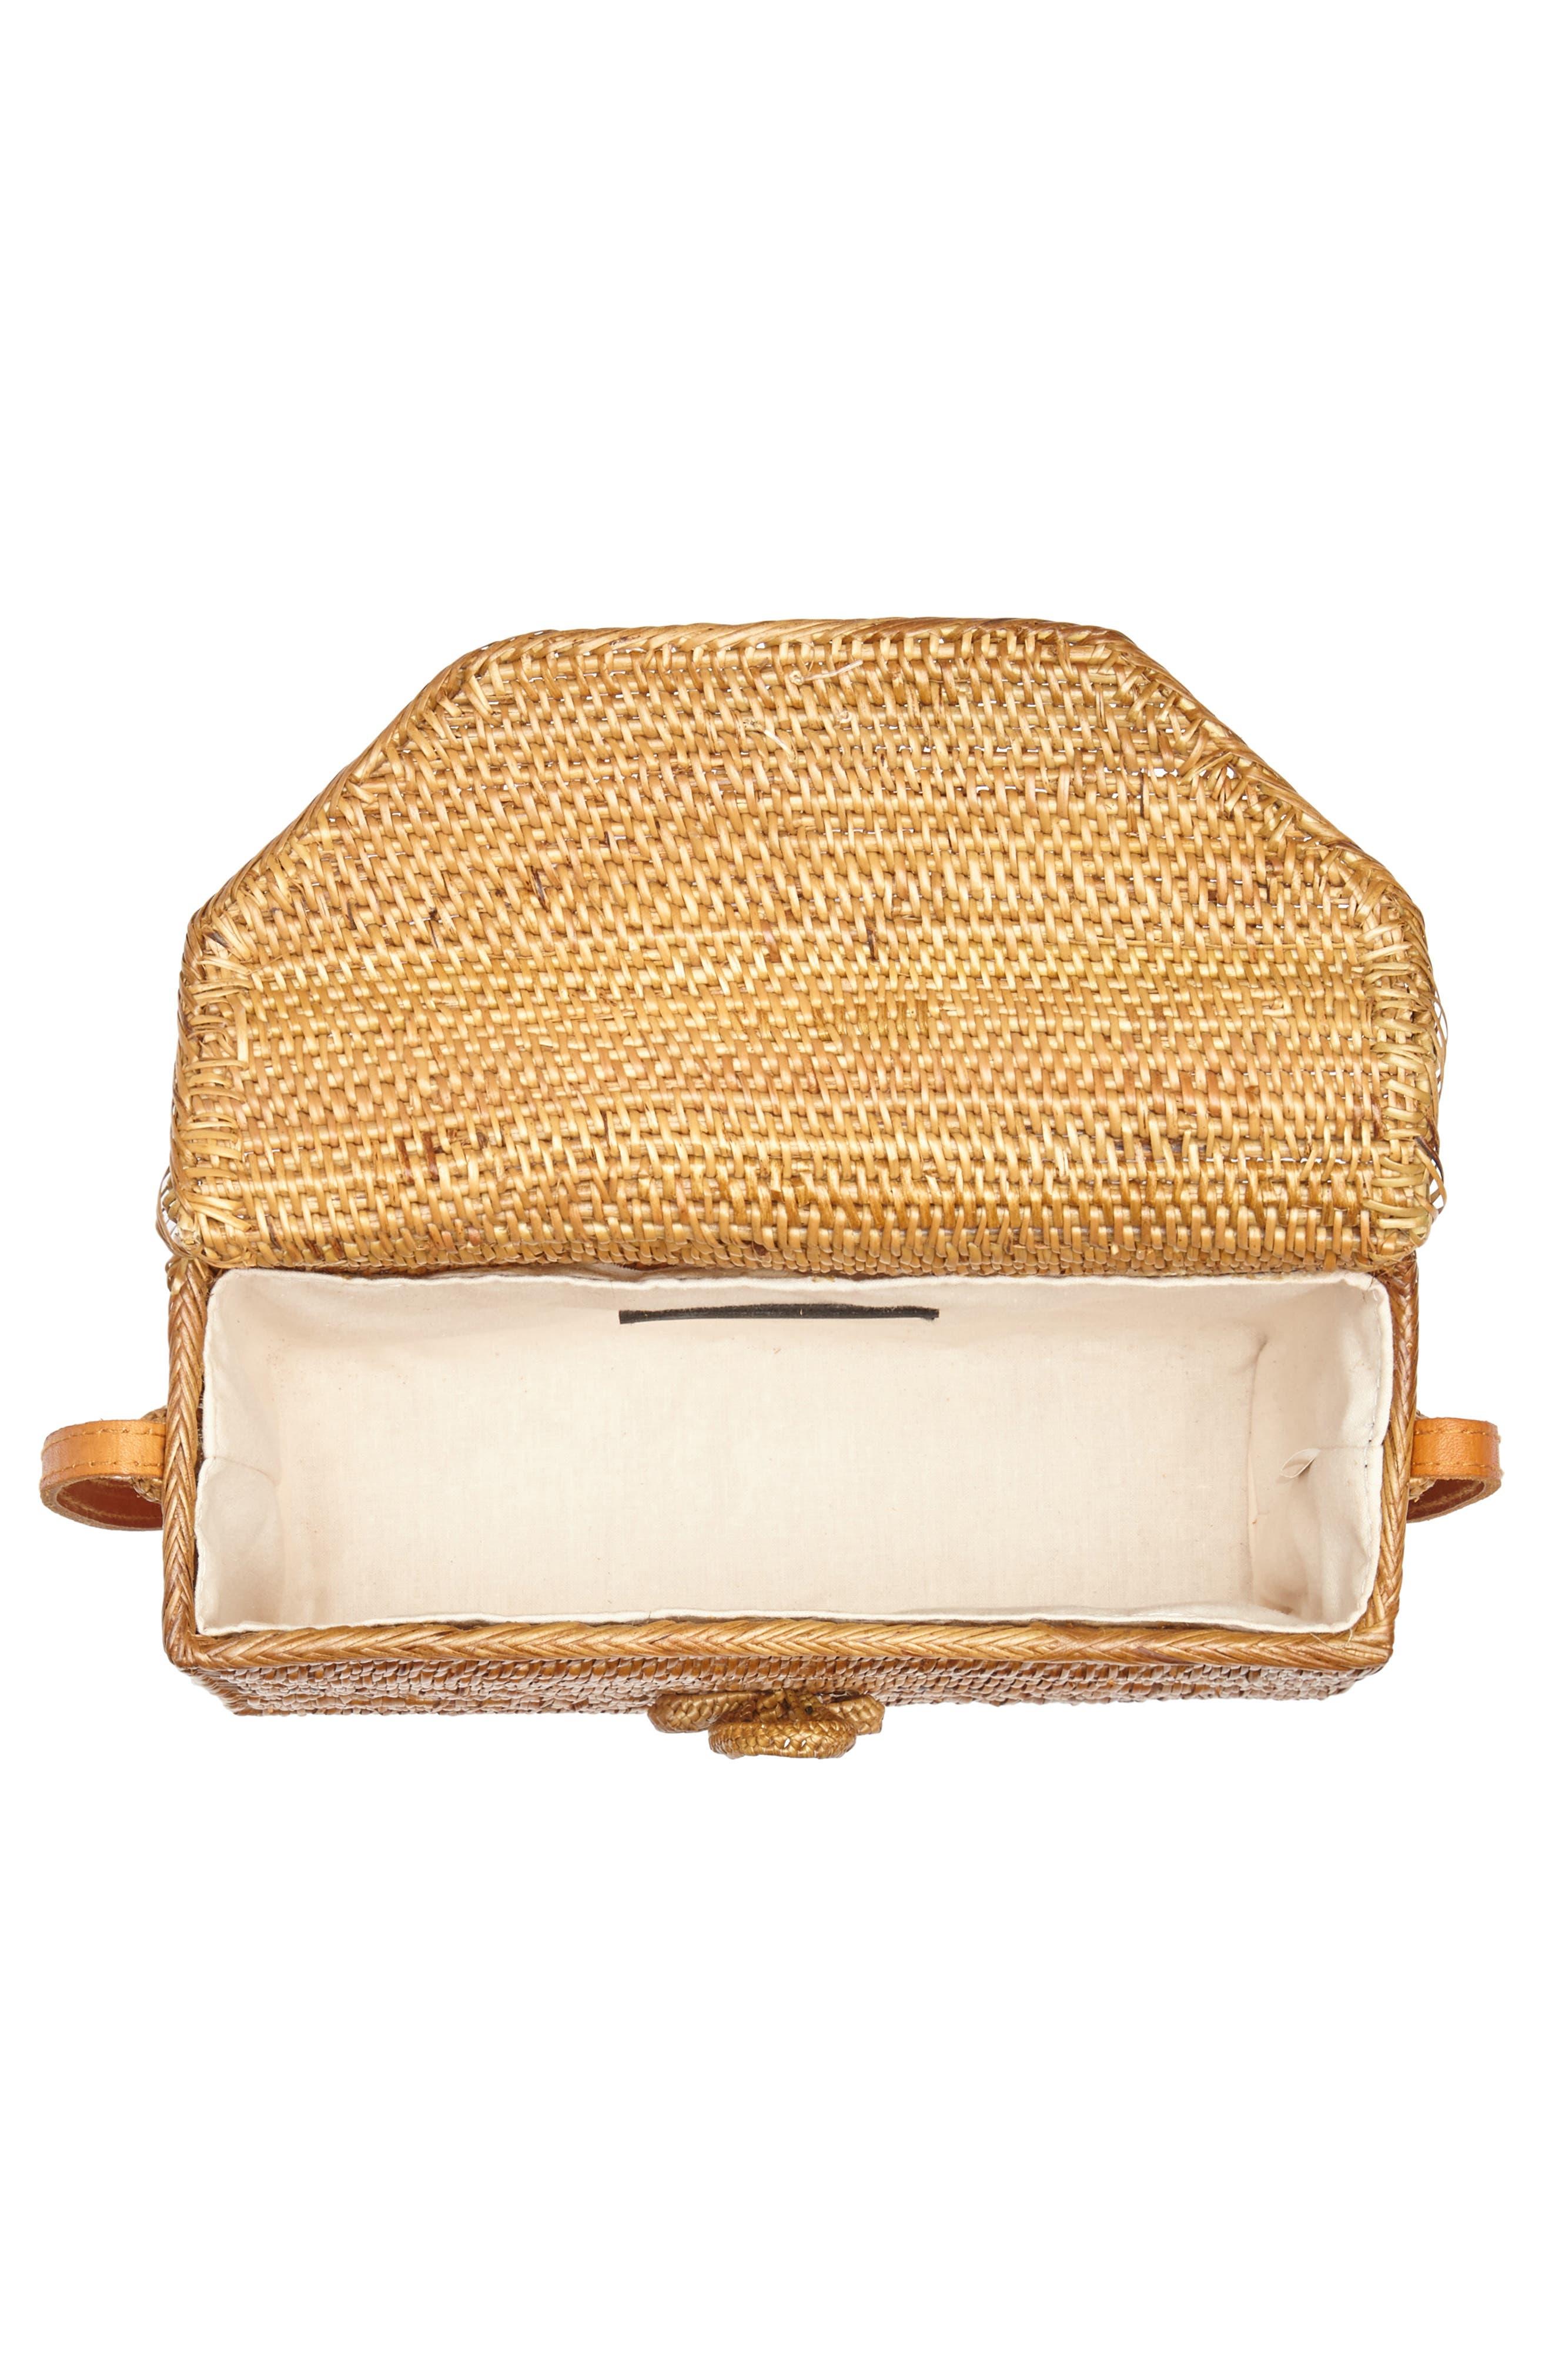 Woven Rattan Box Crossbody Bag,                             Alternate thumbnail 4, color,                             230